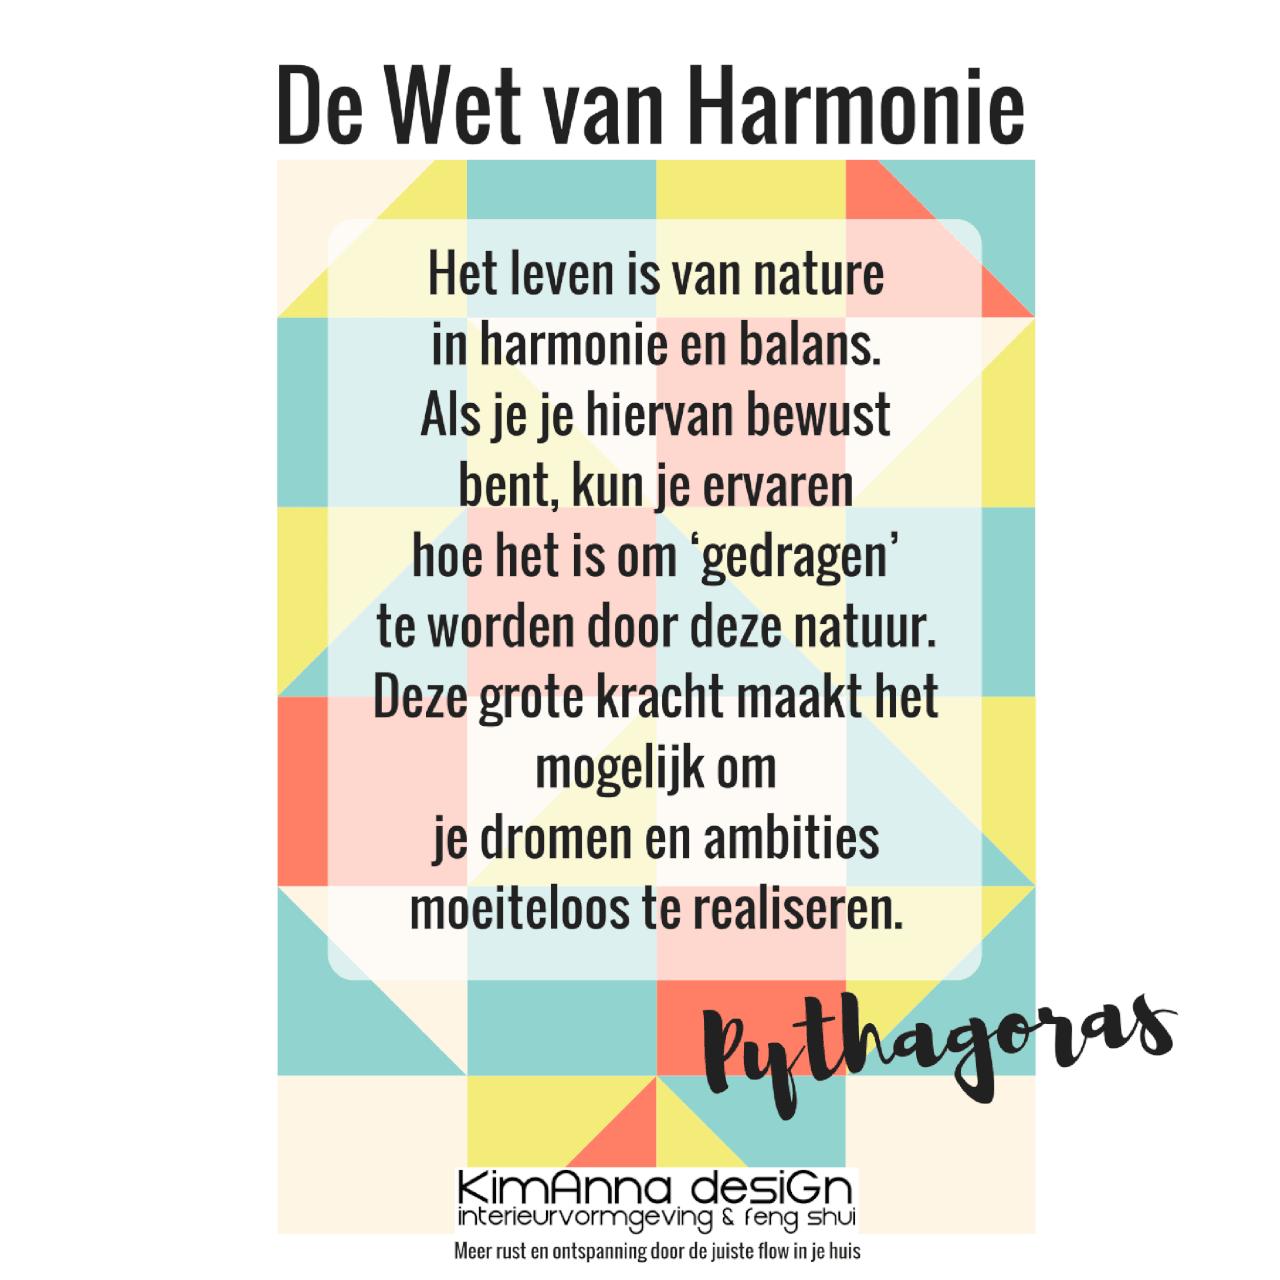 Pytagoras en De Wet van Harmonie, Kim Anna desiGn